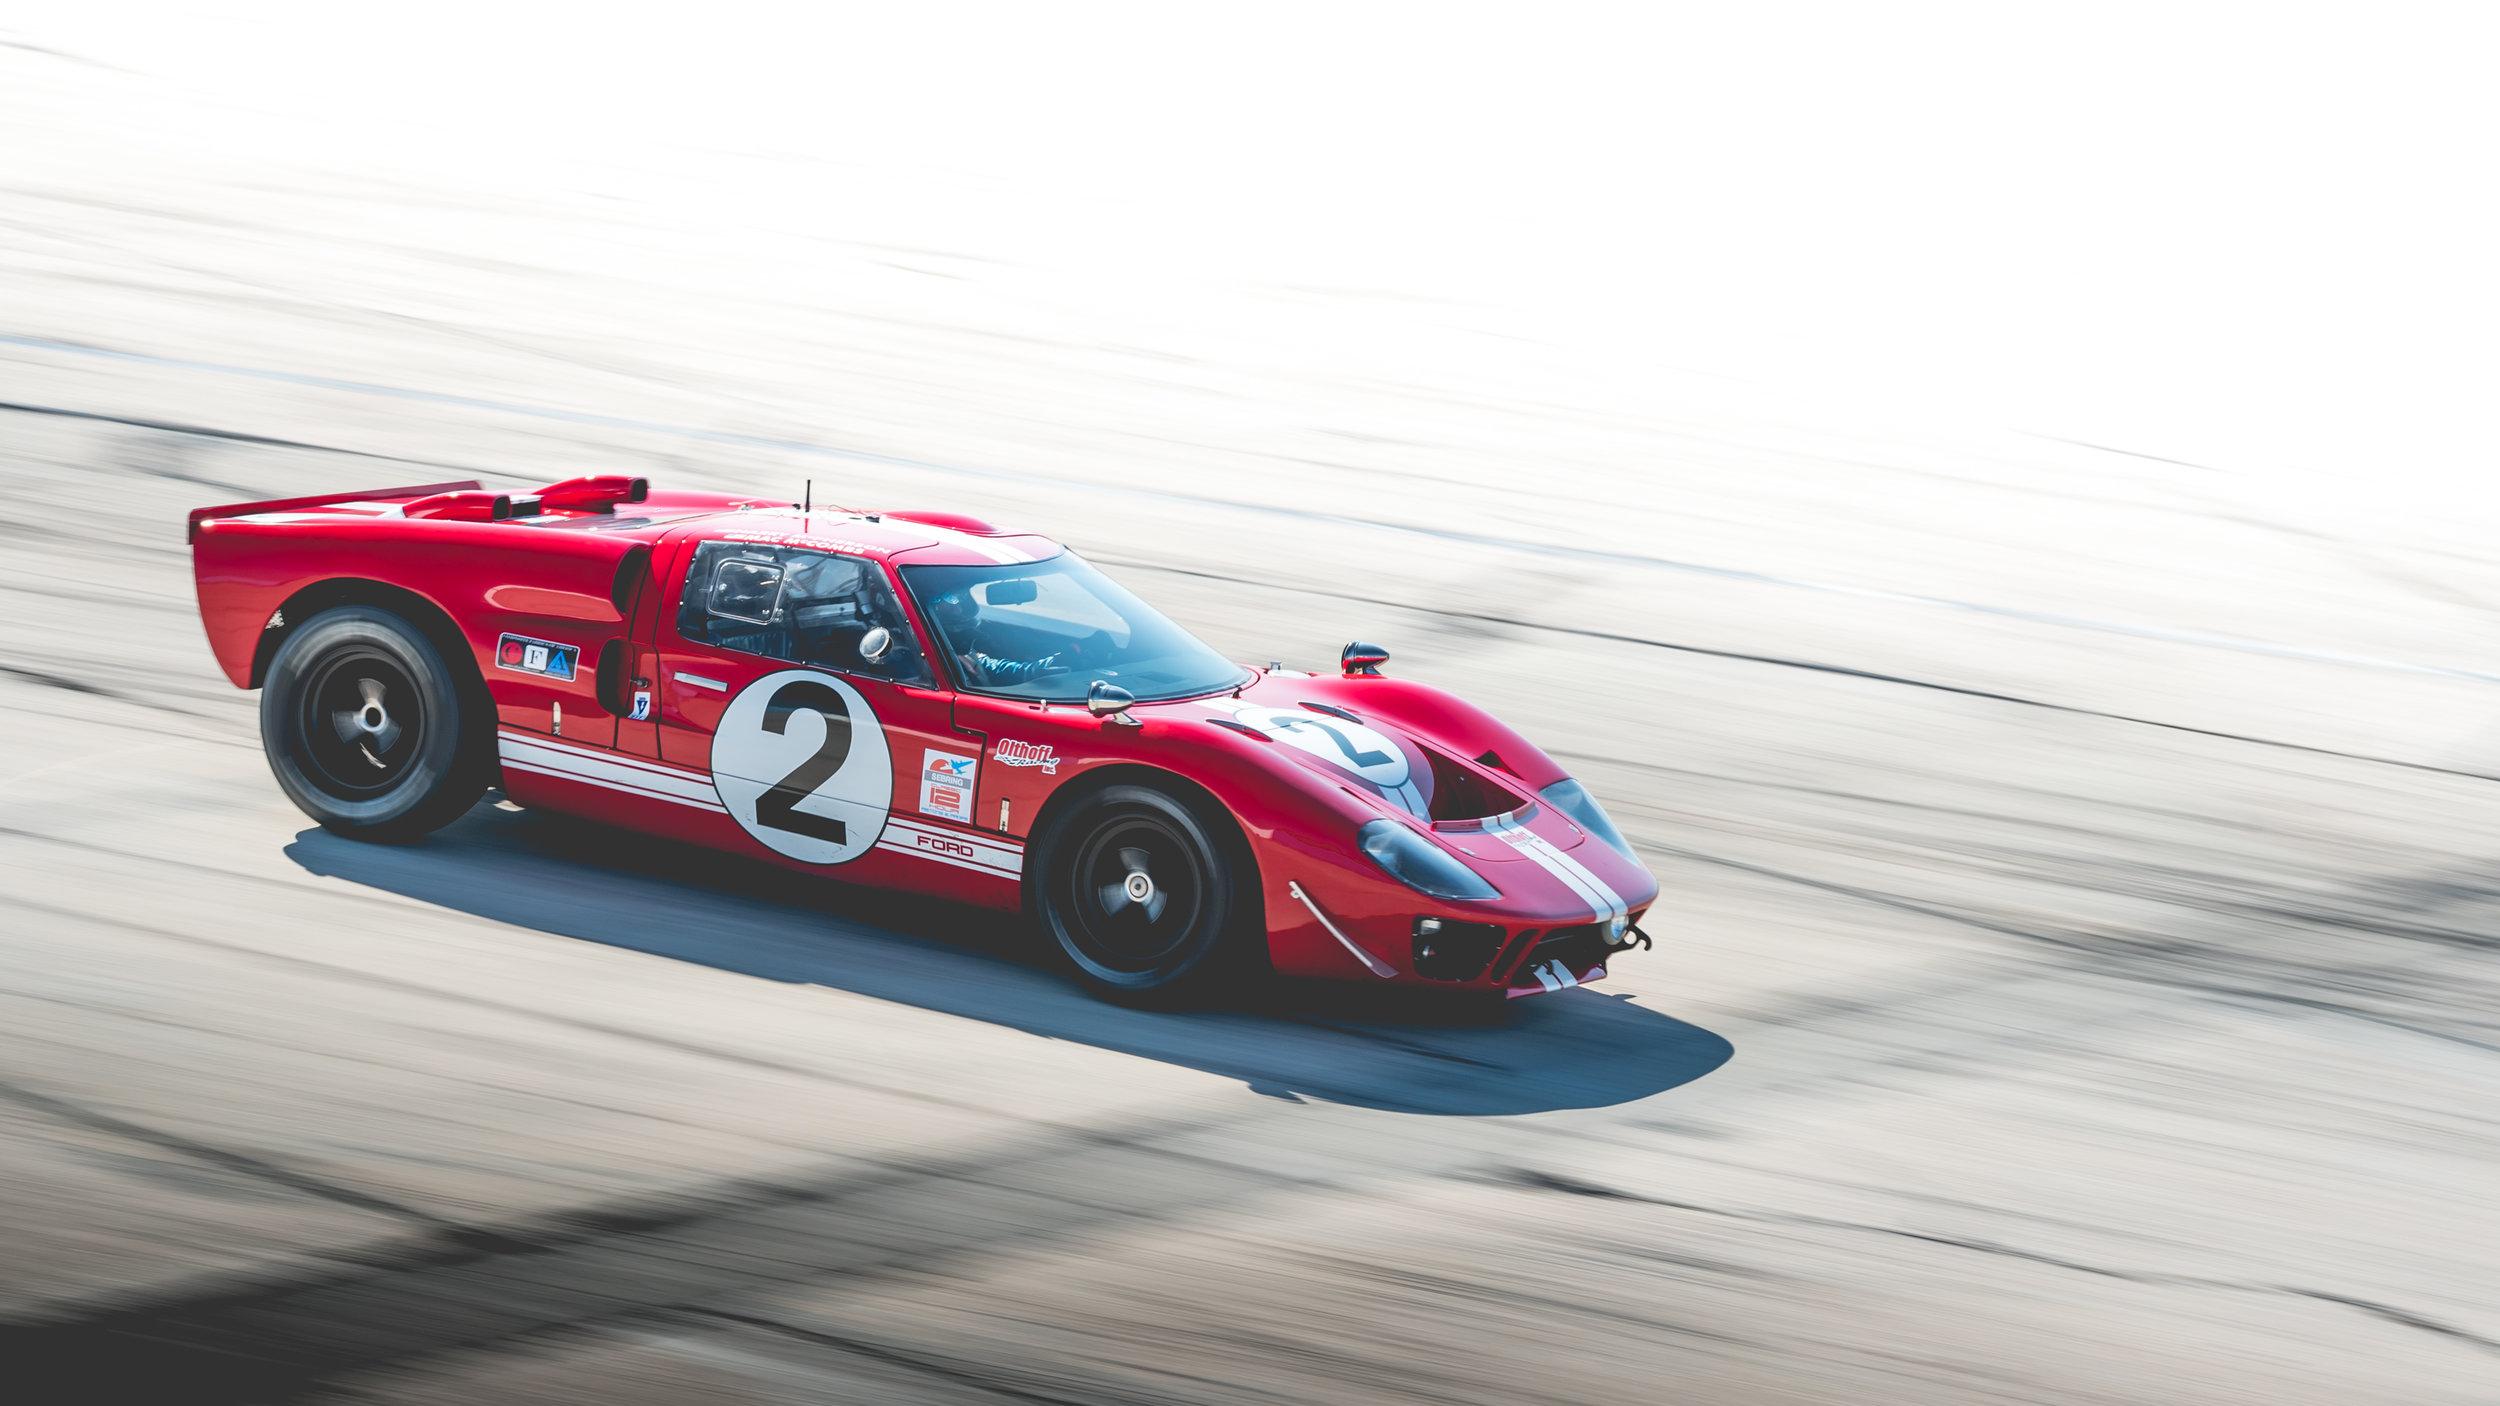 Motorsports - Capturing The Art of Racing